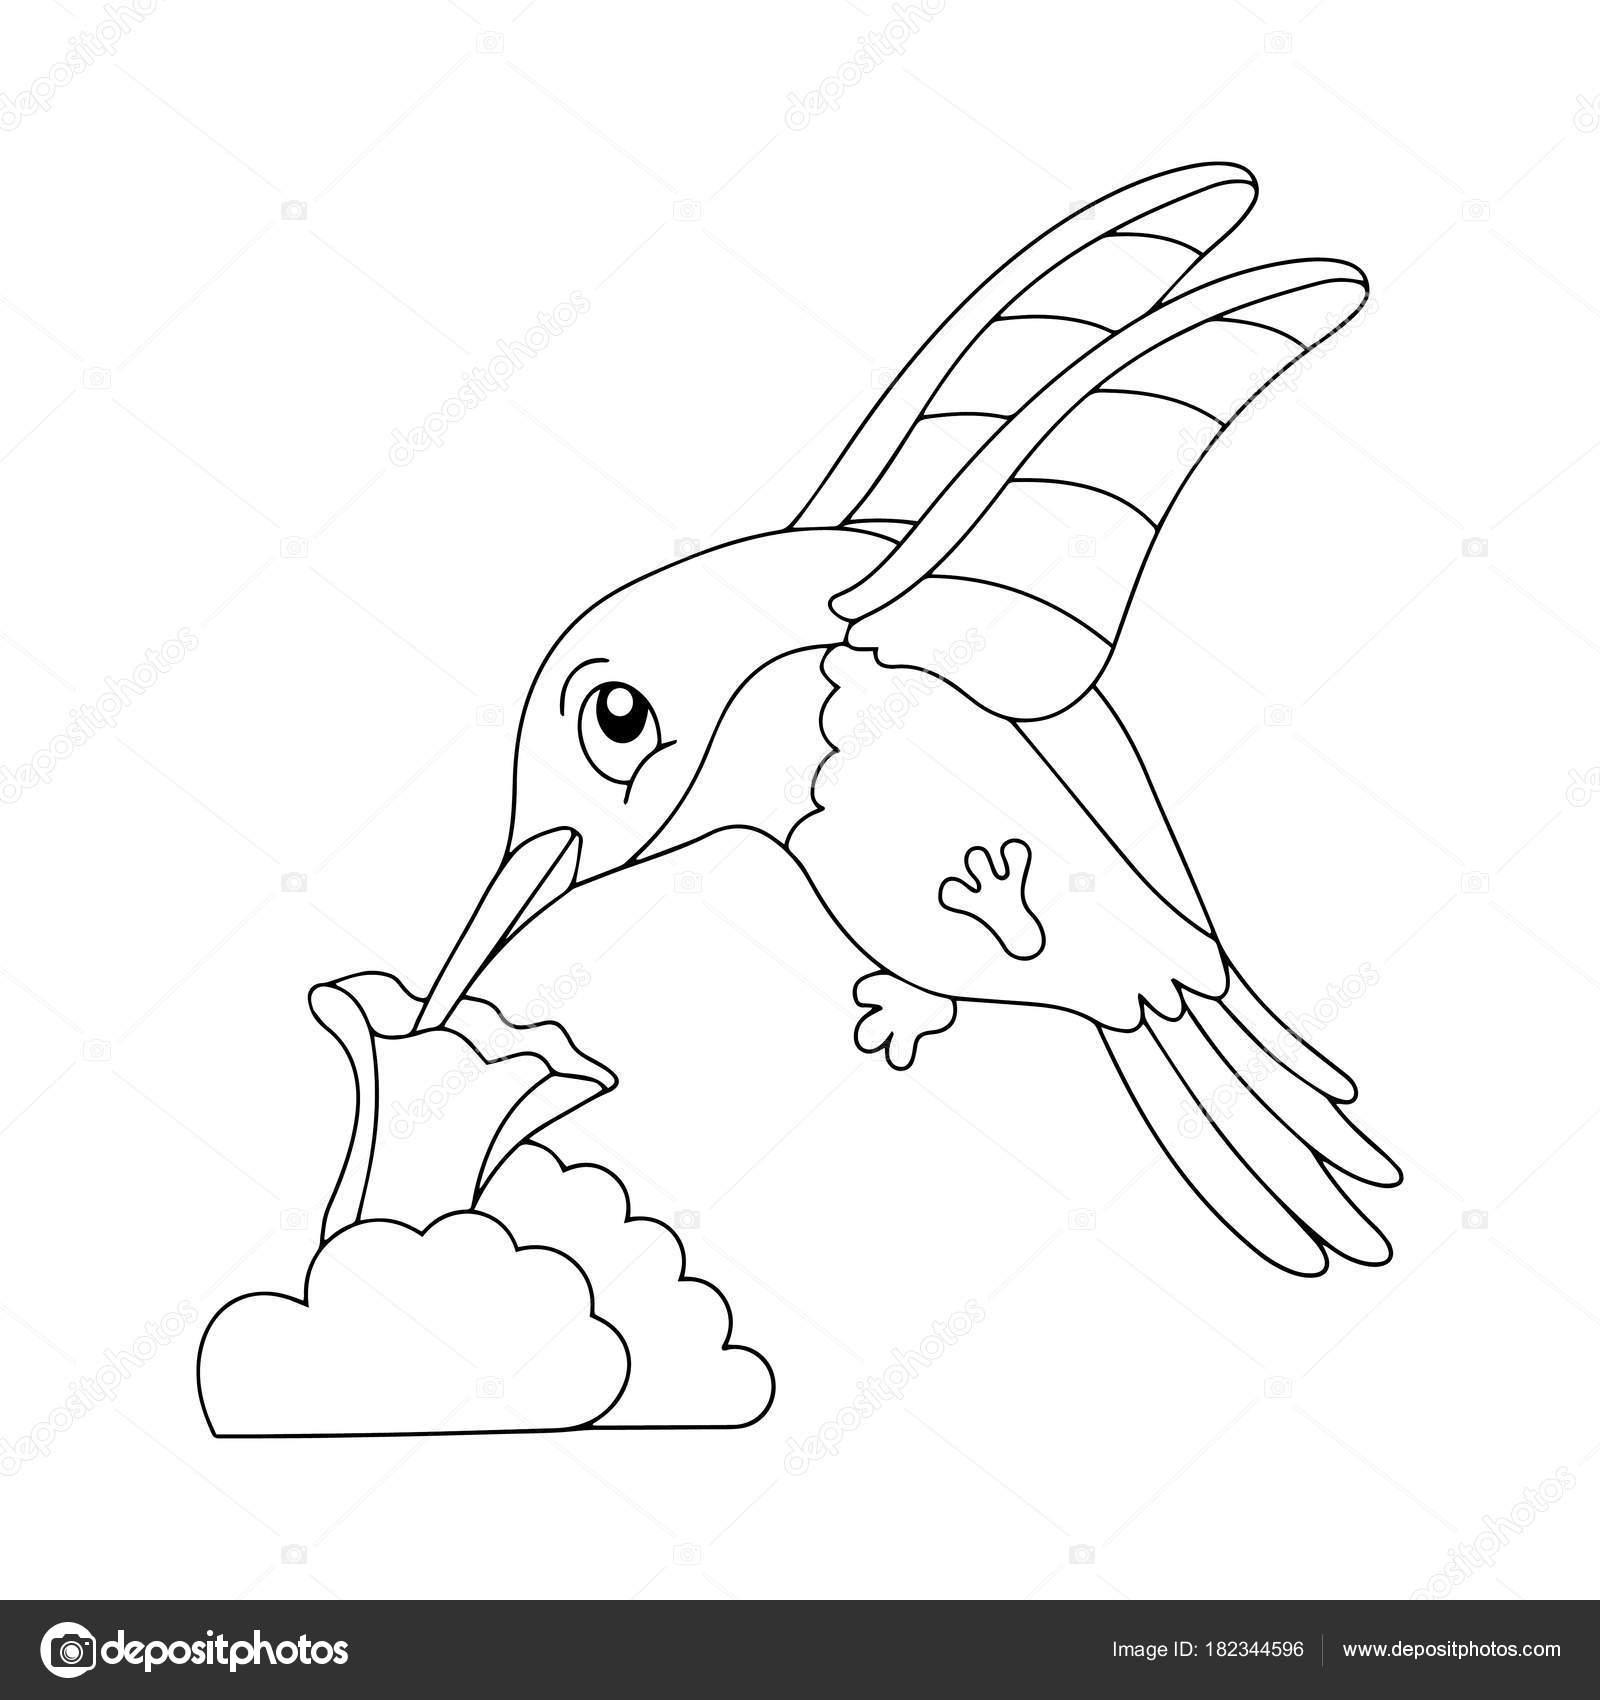 Dibujos Manos Ala Obra Animados Impresiones Dibujos